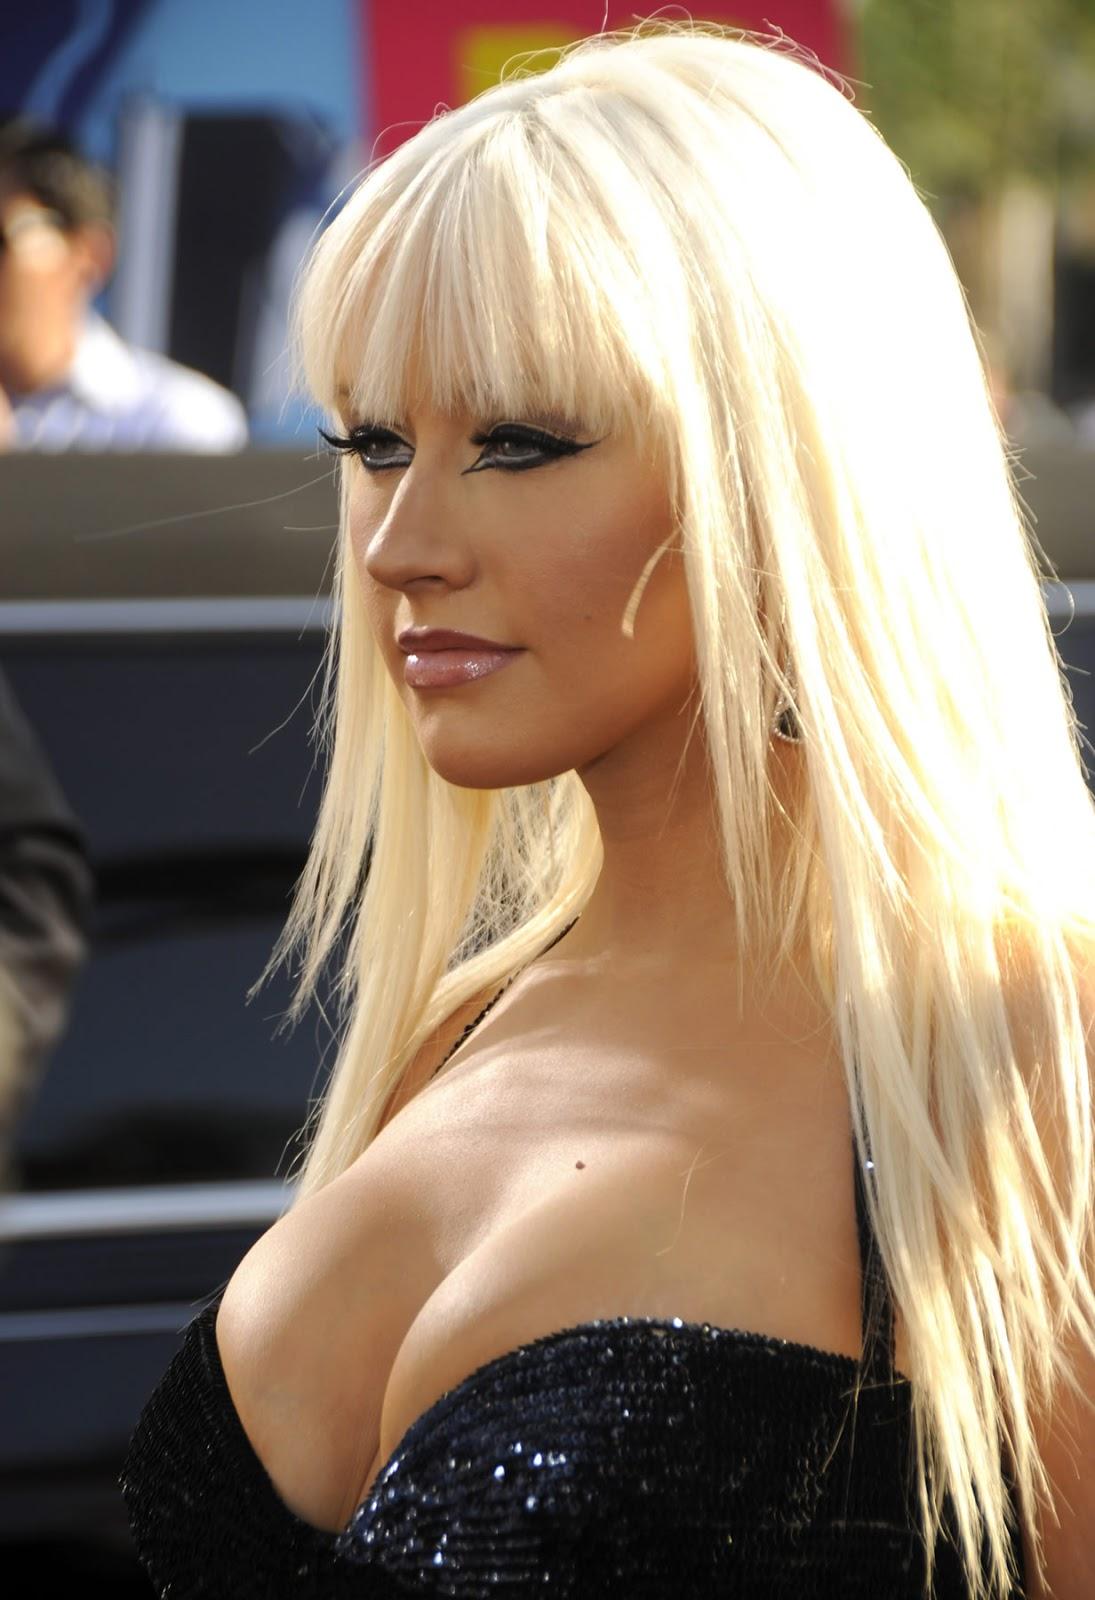 breast Barbar size eden